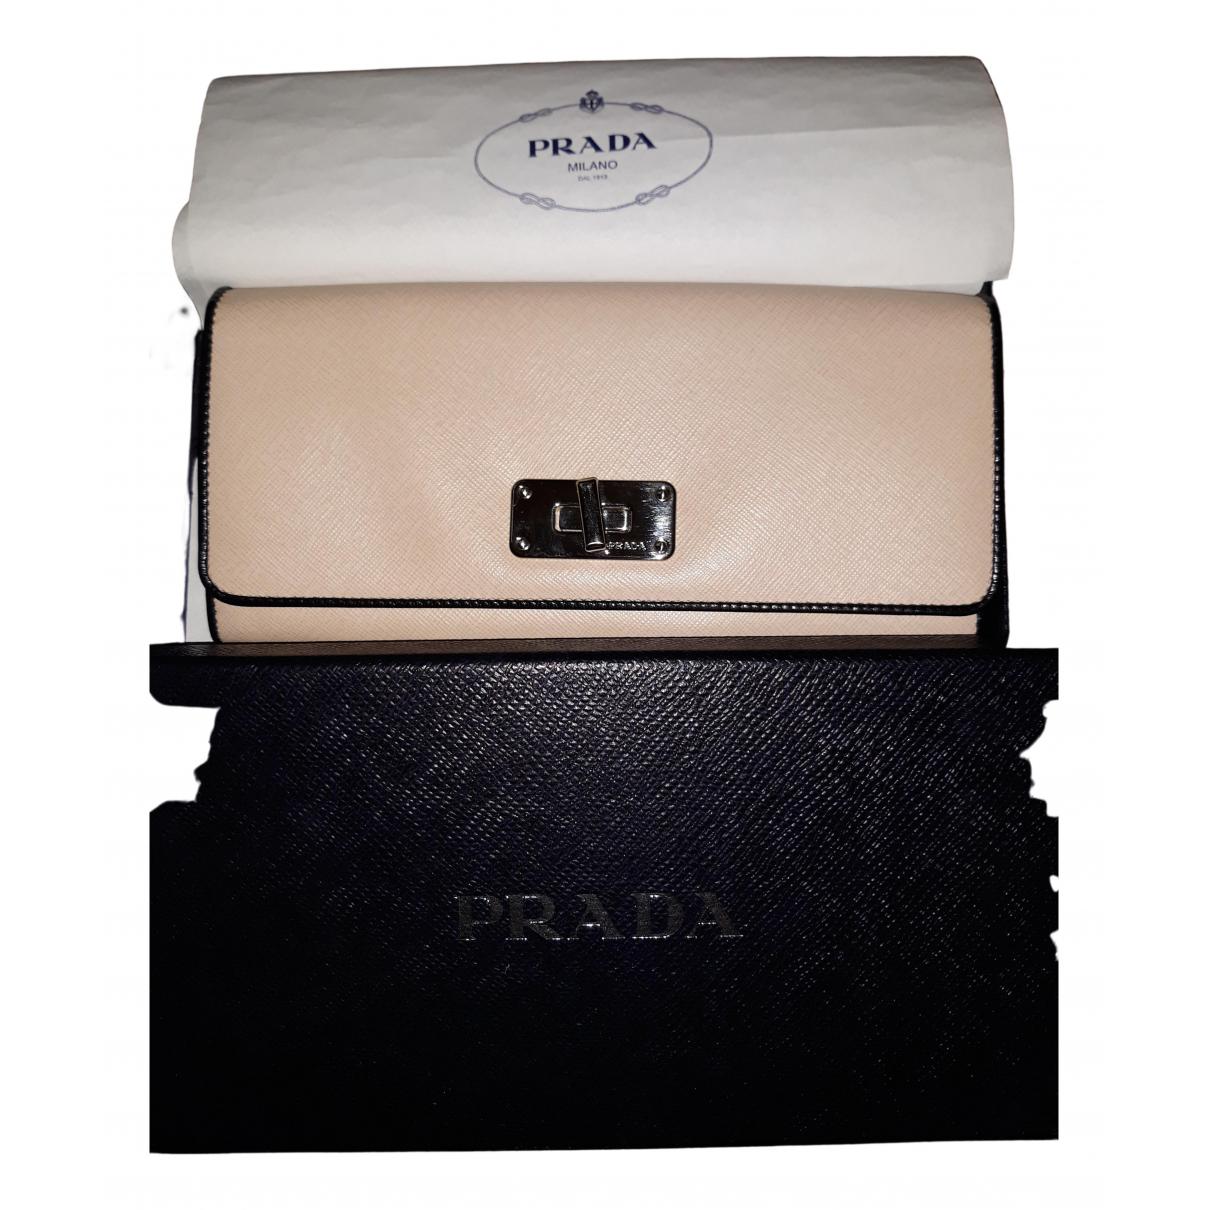 Prada - Portefeuille   pour femme en cuir - ecru